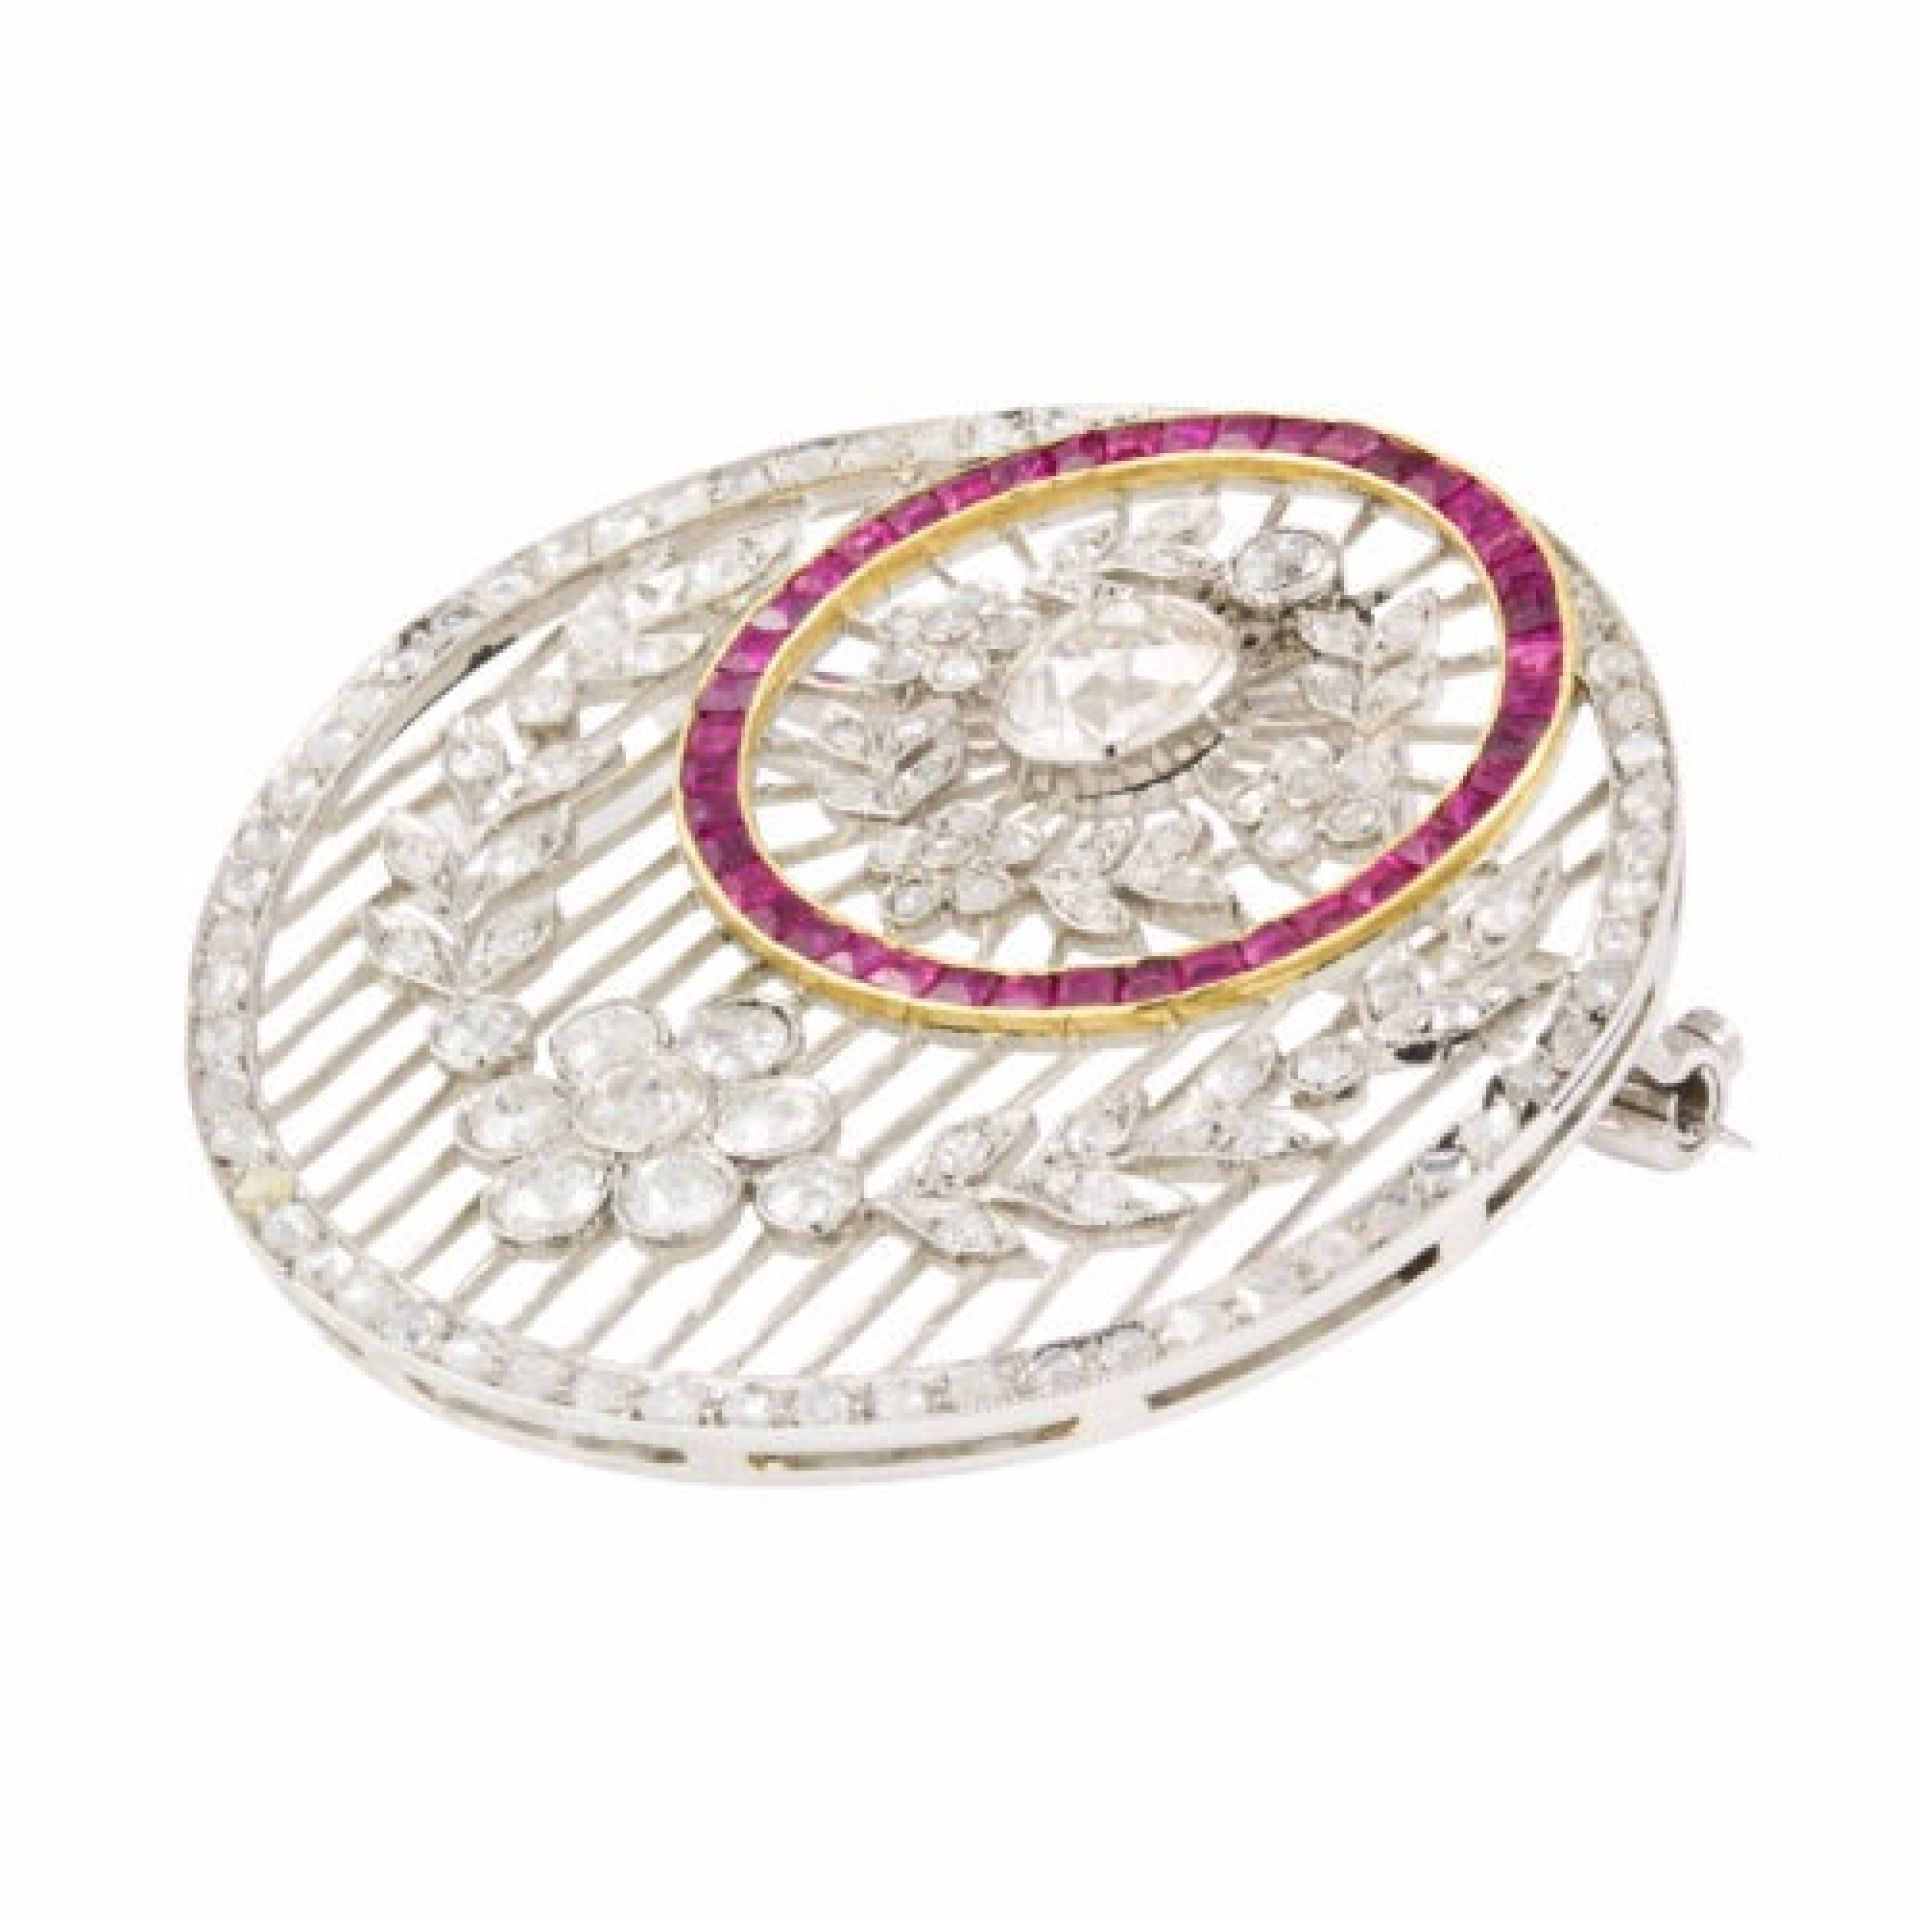 A ruby and diamond pendant